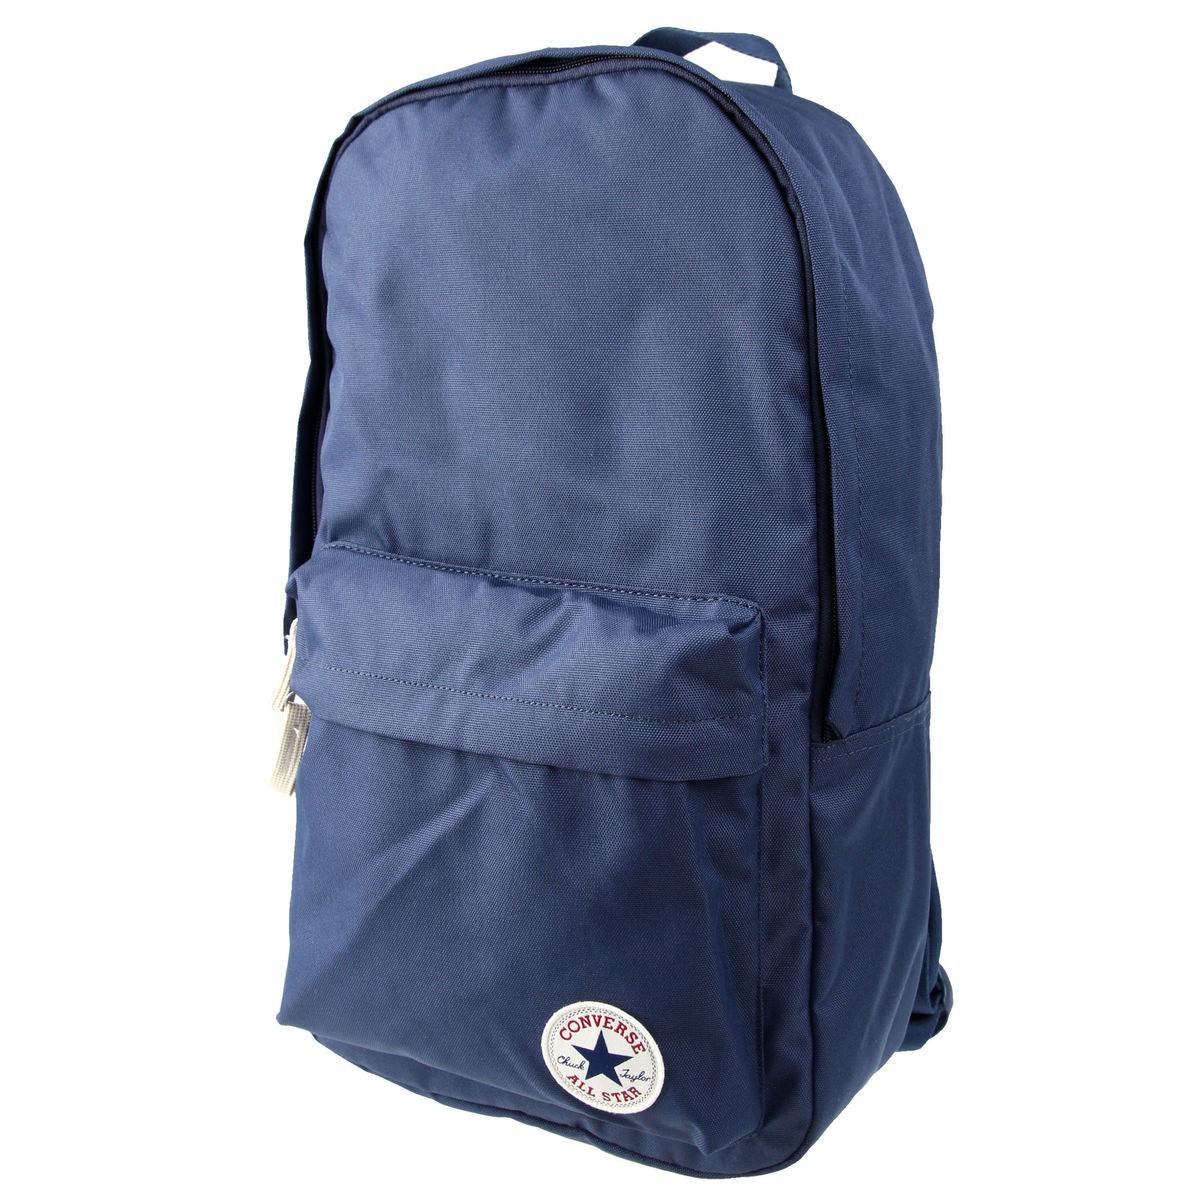 batoh CONVERSE - Core Poly - Blue - 10002651-410